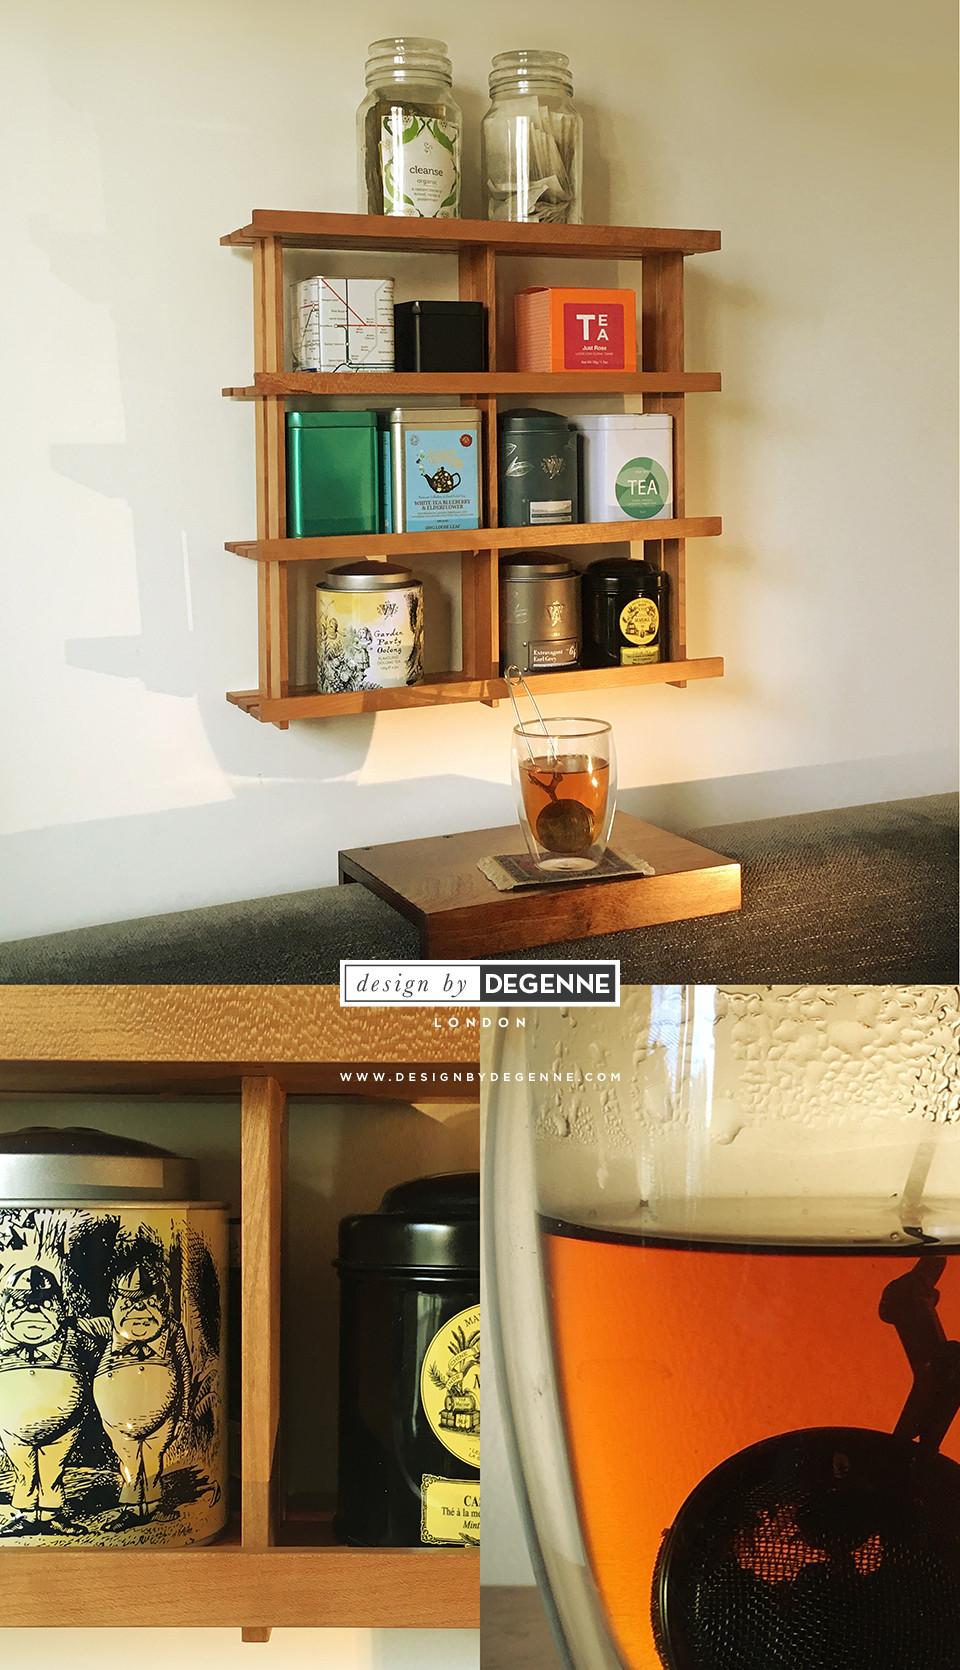 Shelf for tea caddies in solid cherry